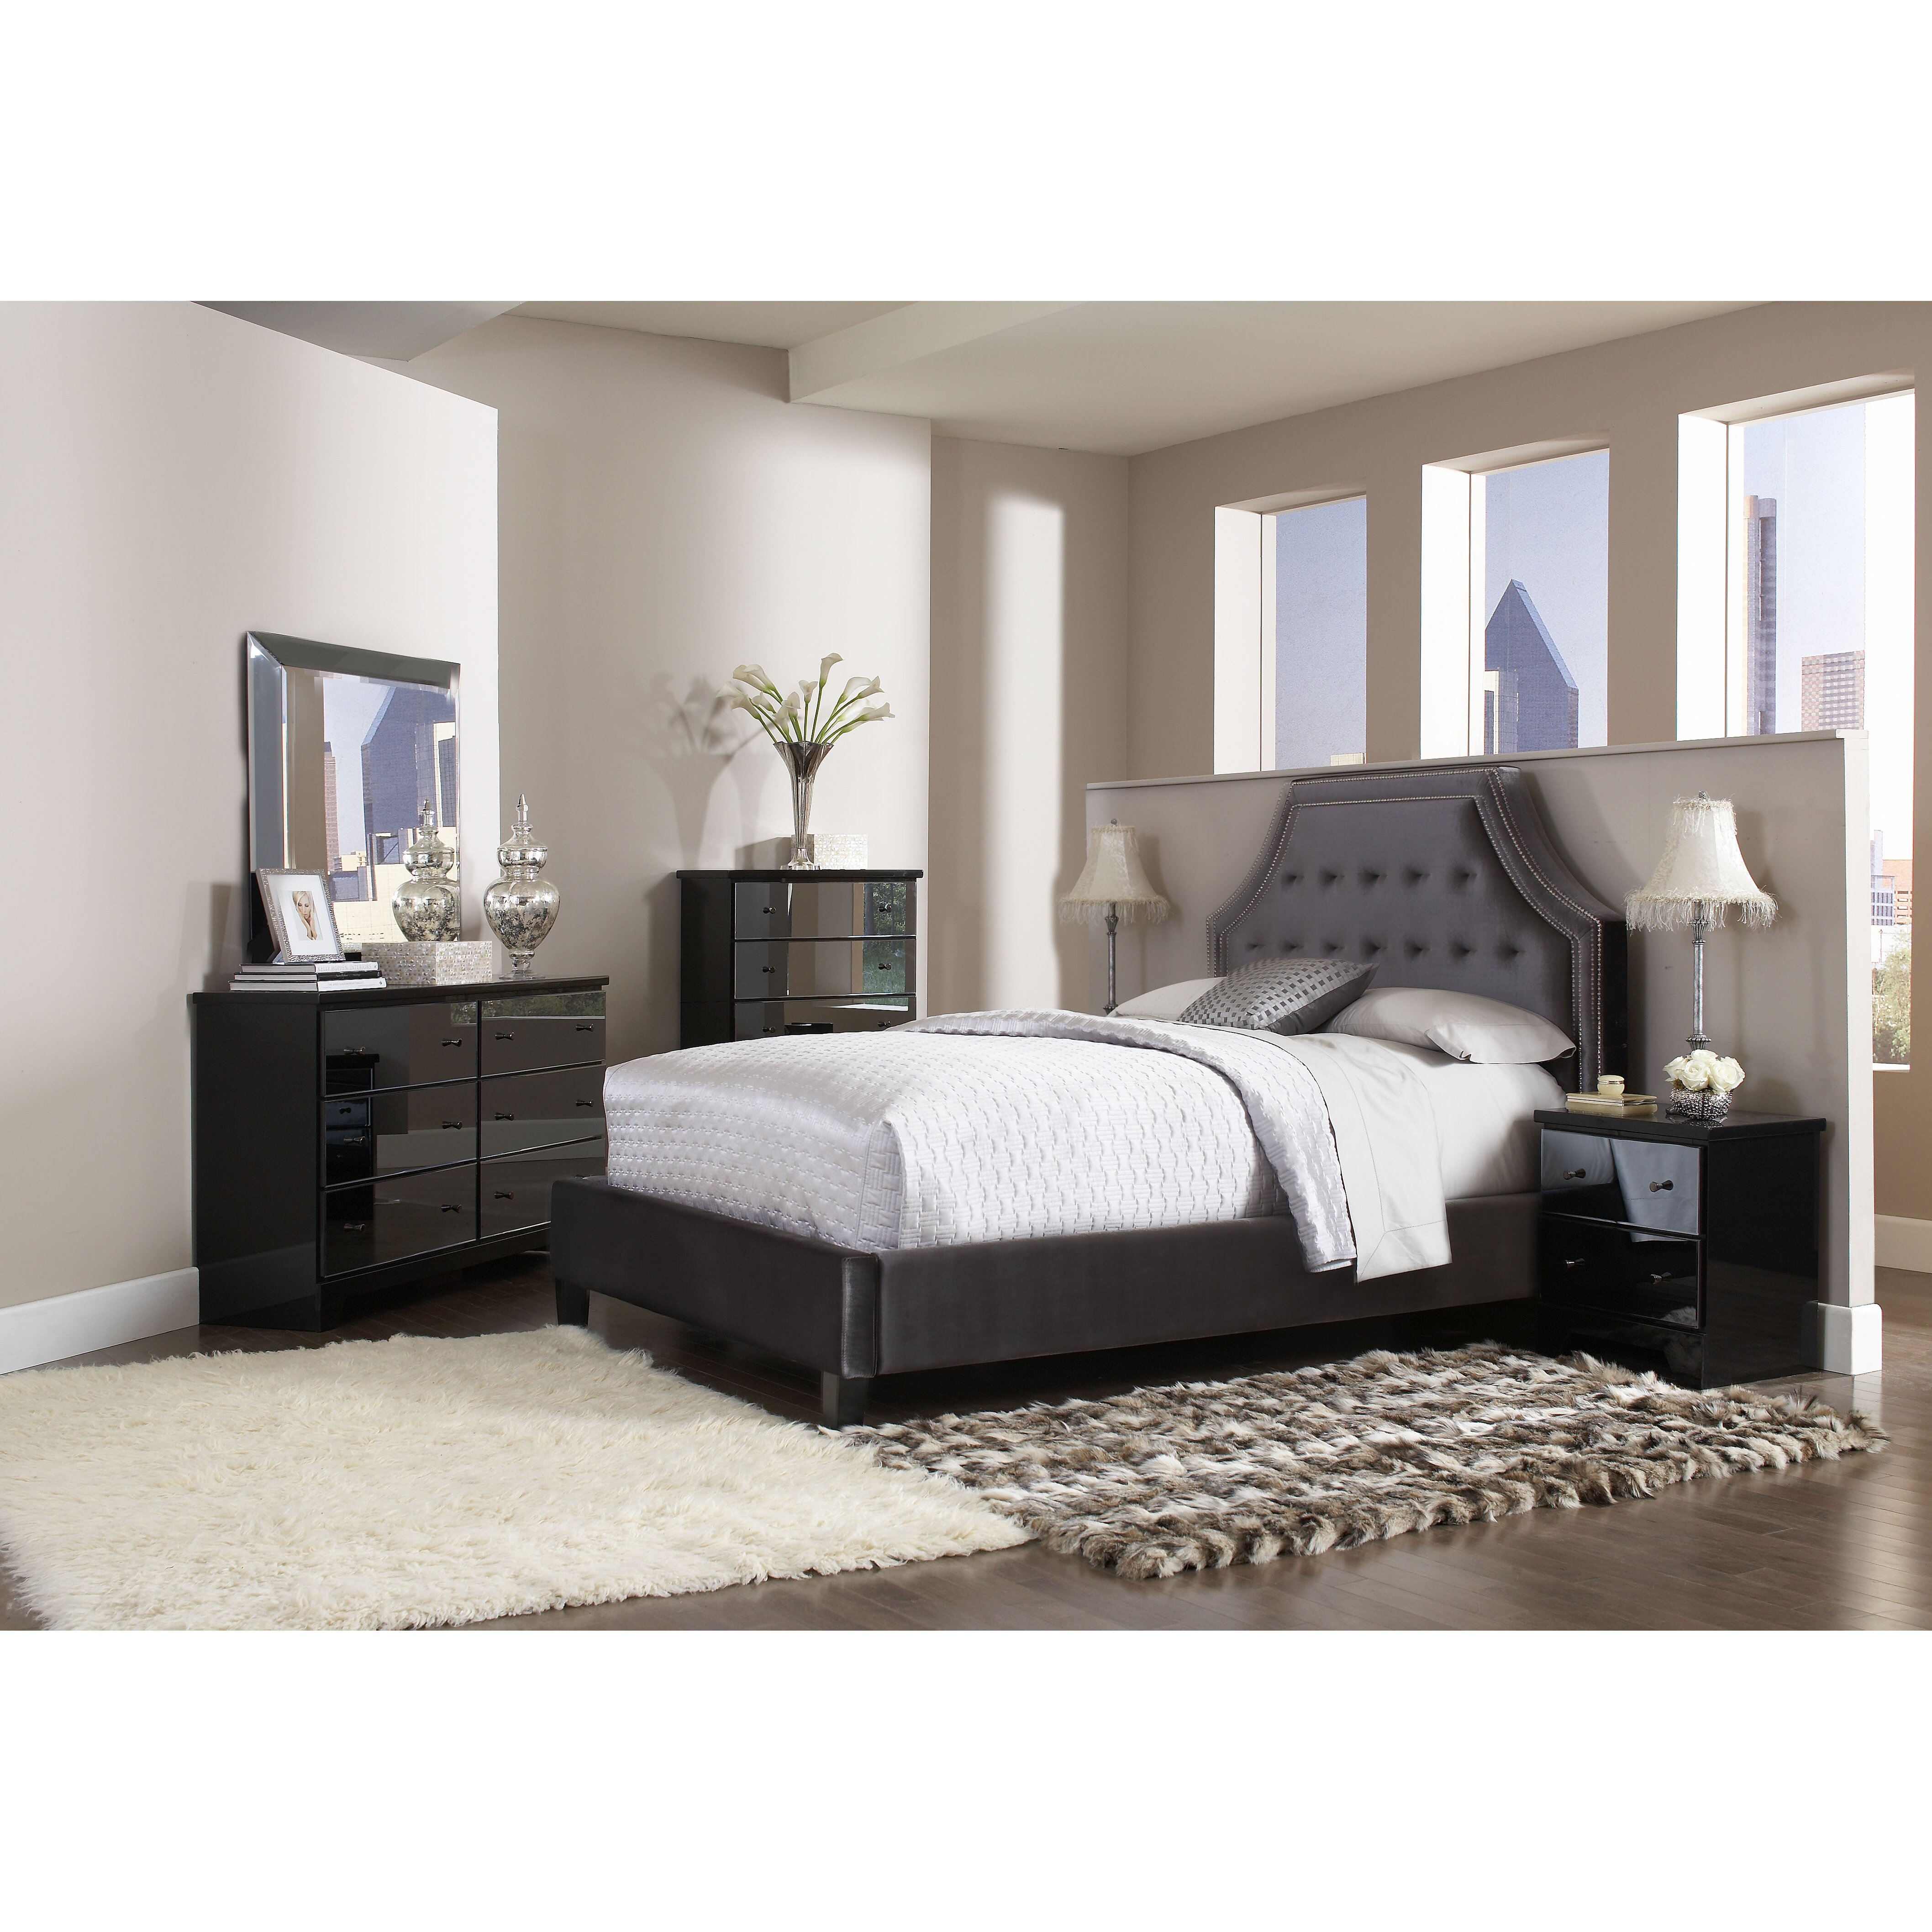 Standard Furniture Boulevard Upholstered Platform Bed Reviews Wayfair